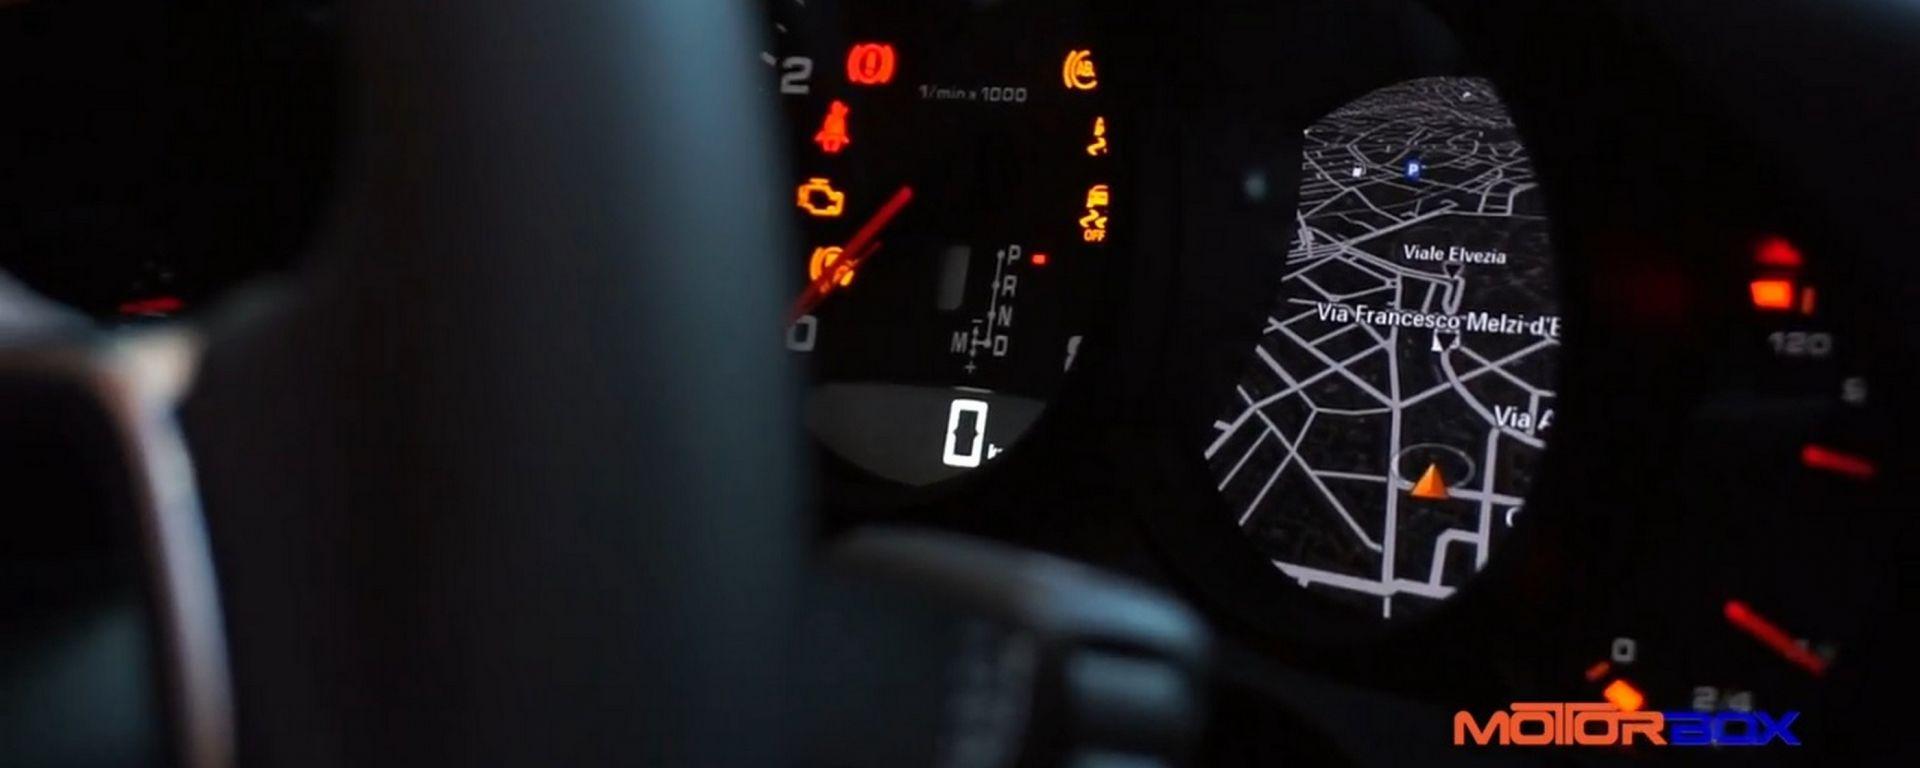 Porsche 911: la prova dell'infotainment